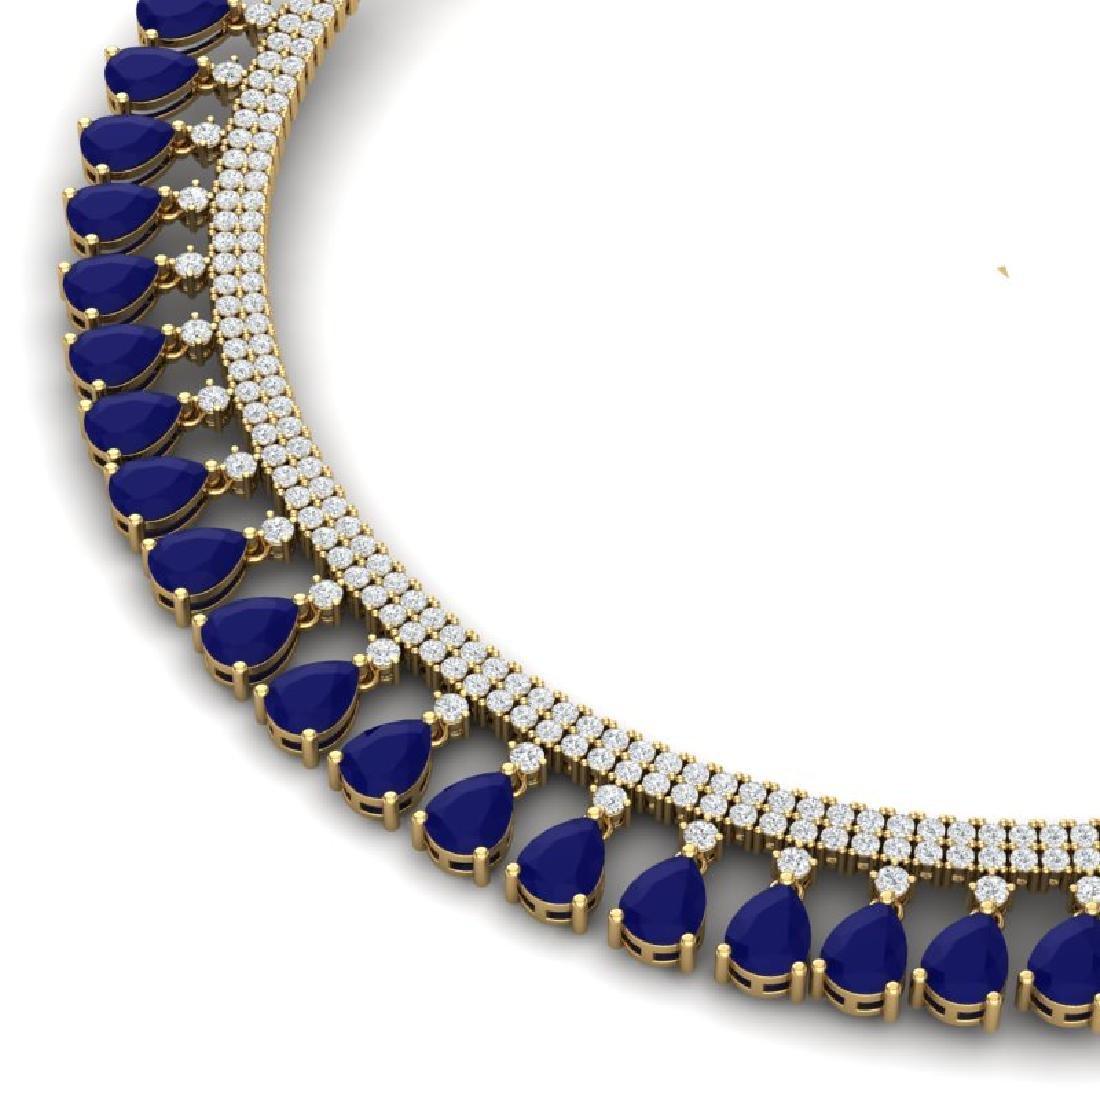 51.75 CTW Royalty Sapphire & VS Diamond Necklace 18K